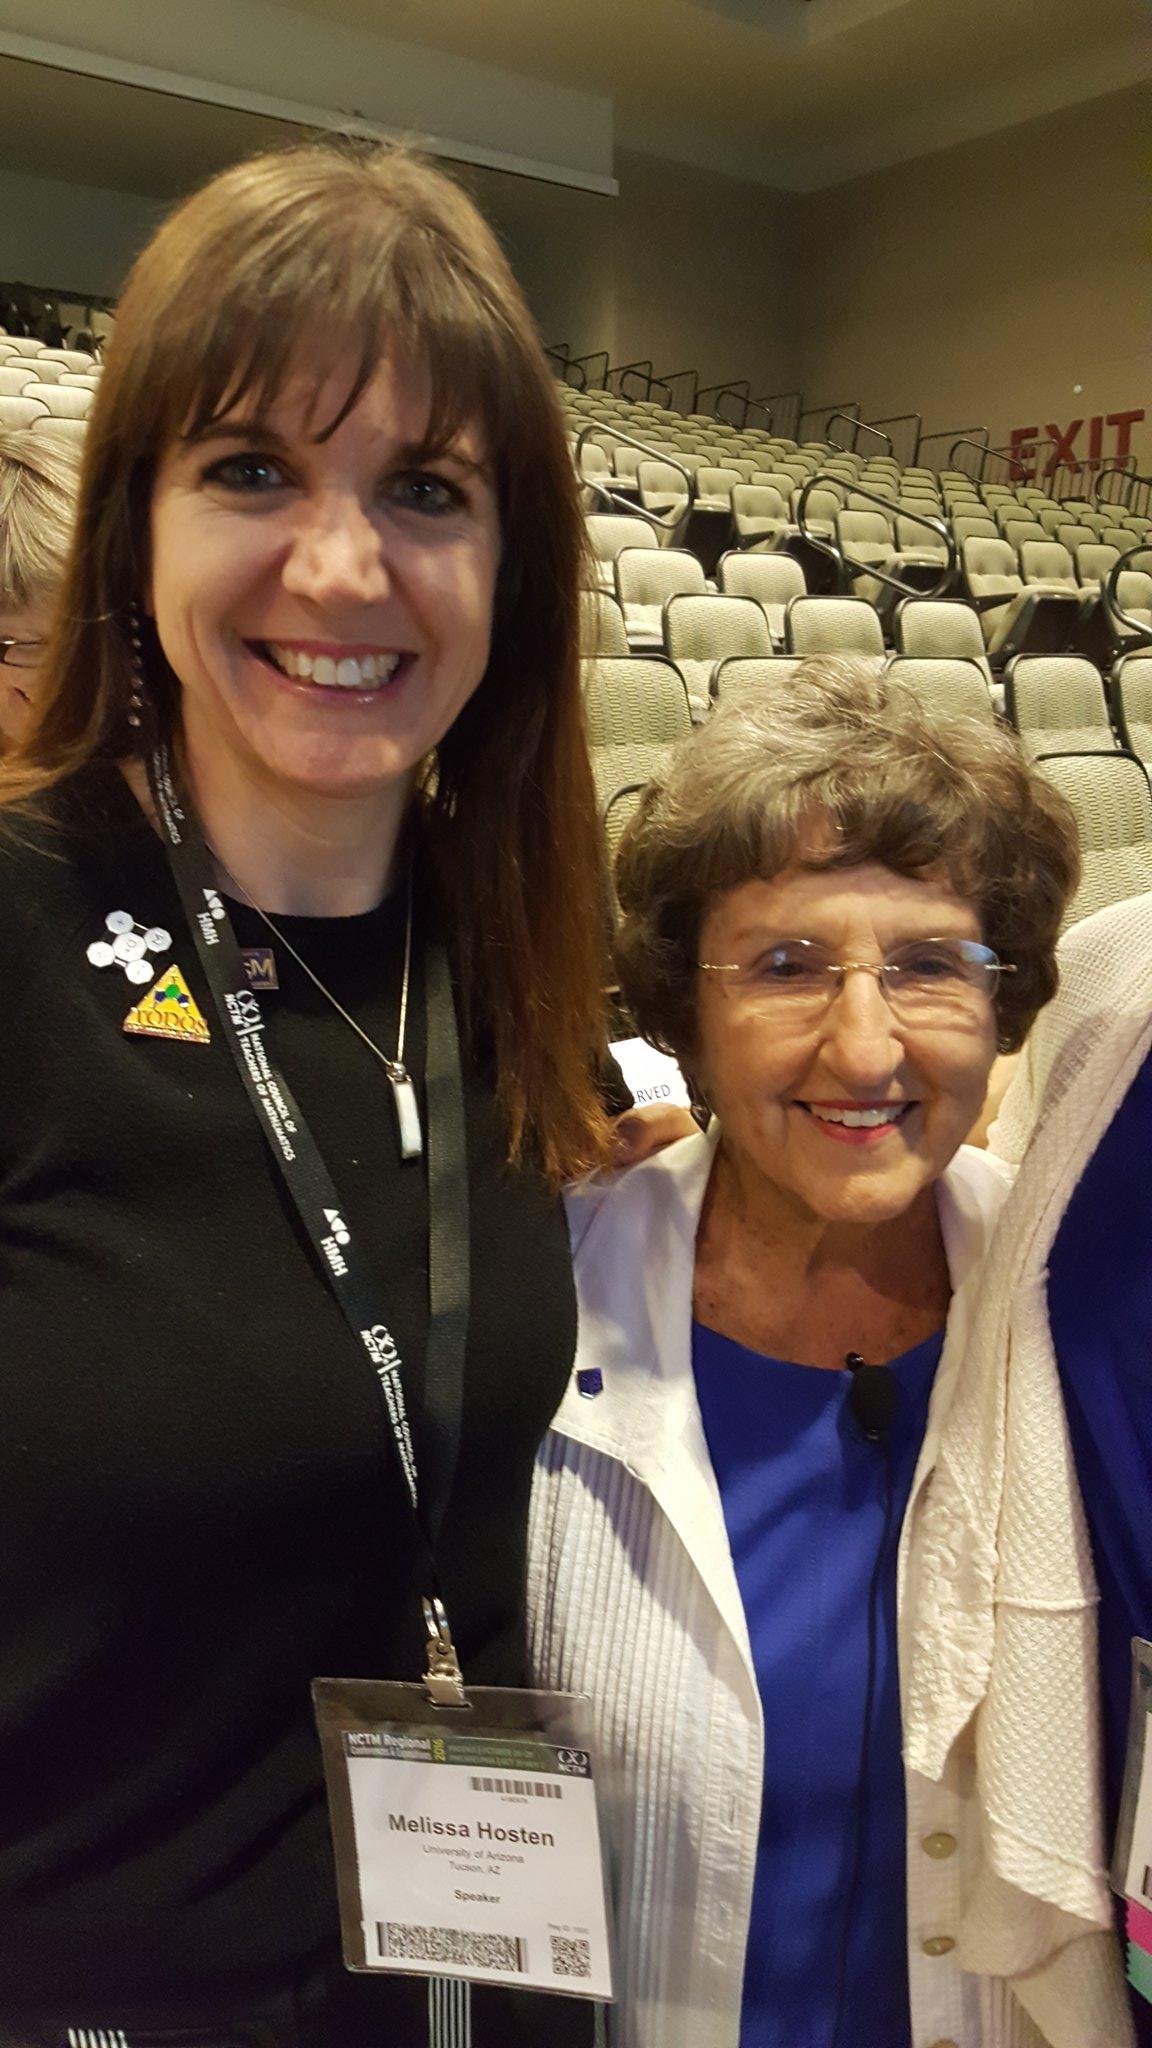 So excited to tweet for Shirley Frye #presIgnite #NCTMregionals https://t.co/9cueABicmK